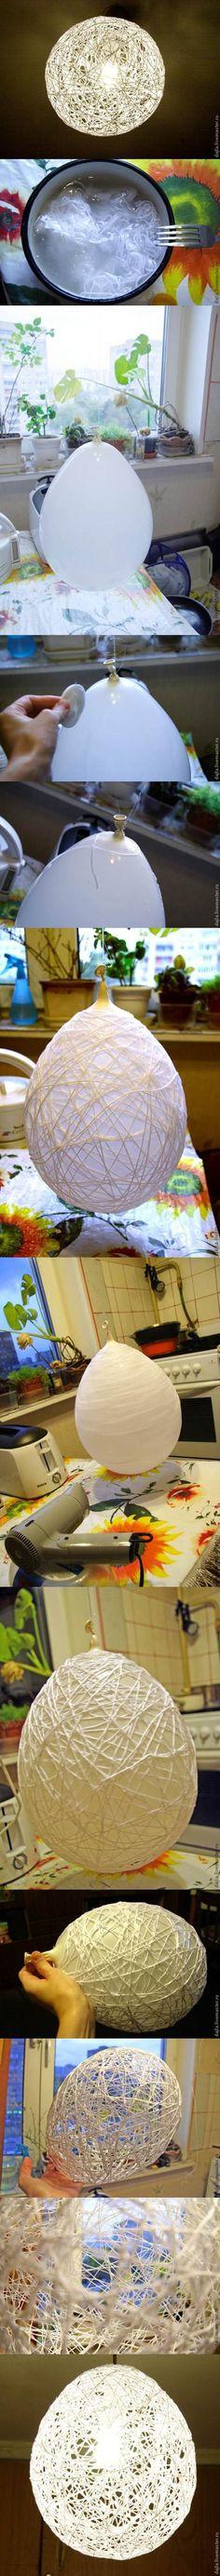 DIY Unique Chandelier from Yarn   iCreativeIdeas.com Like Us on Facebook ==> https://www.facebook.com/icreativeideas